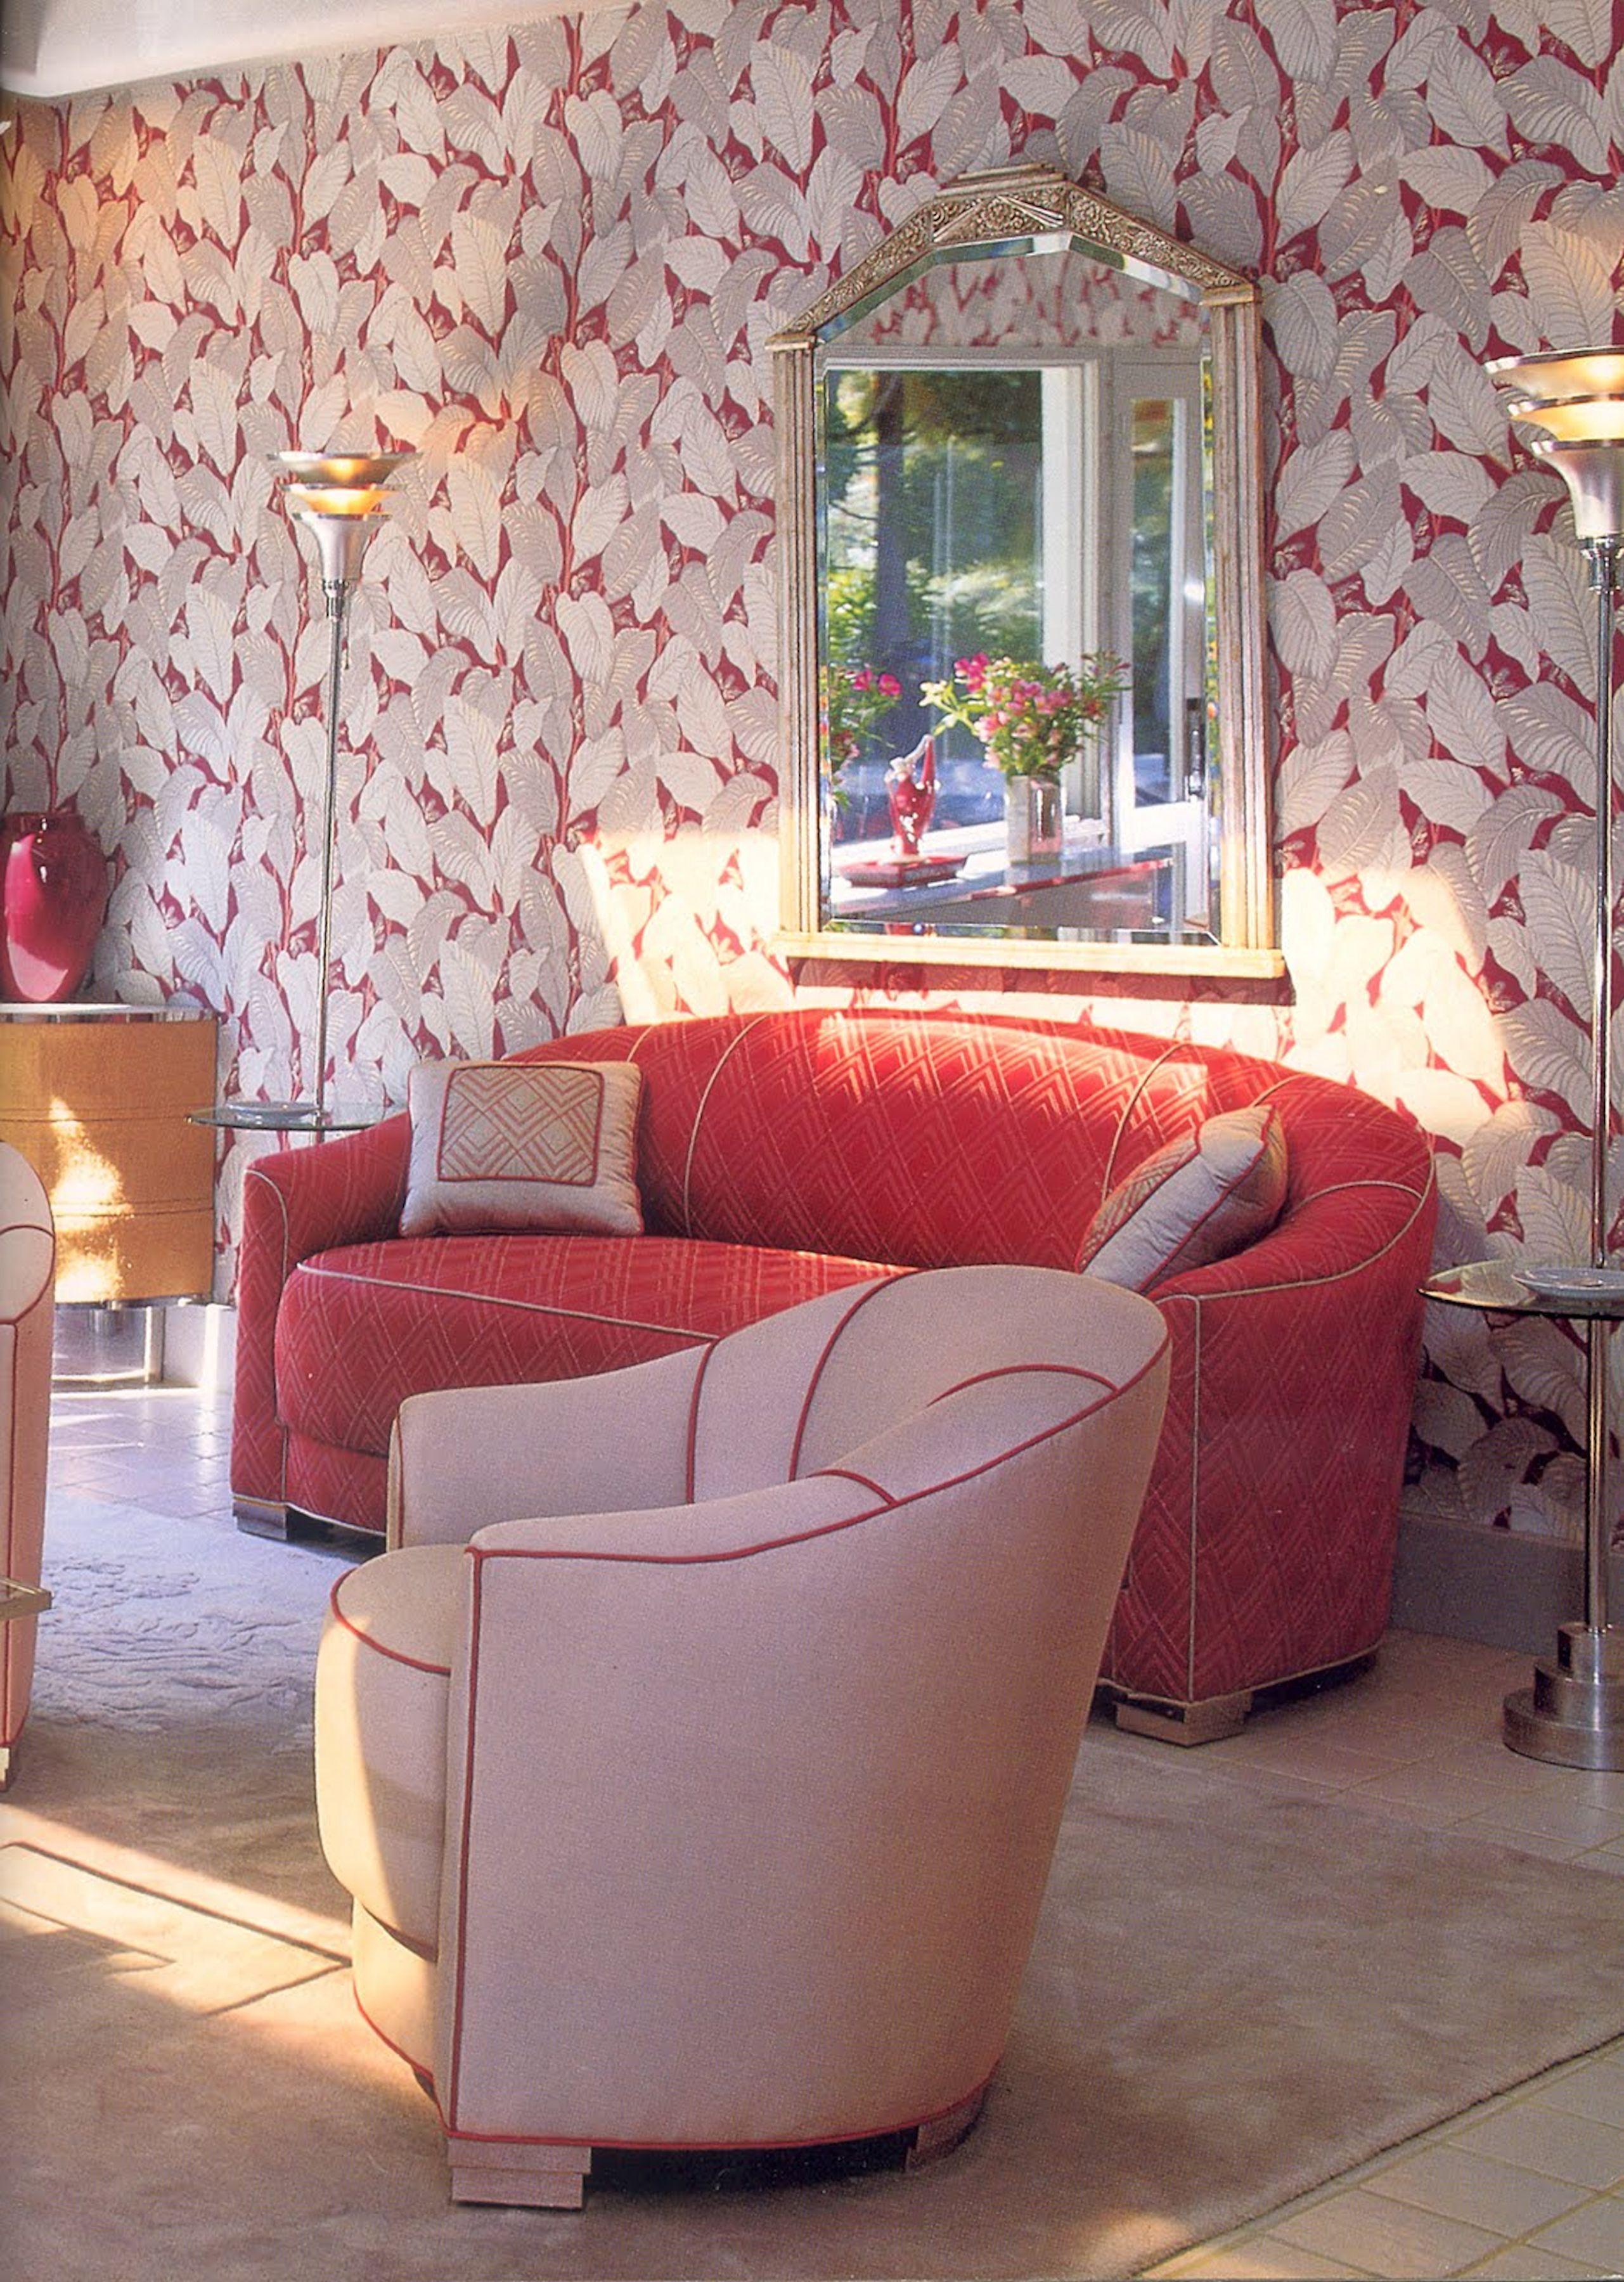 Blue Carpet 1980s Google Search Art Deco Living Room Art Deco Interior Deco Decor